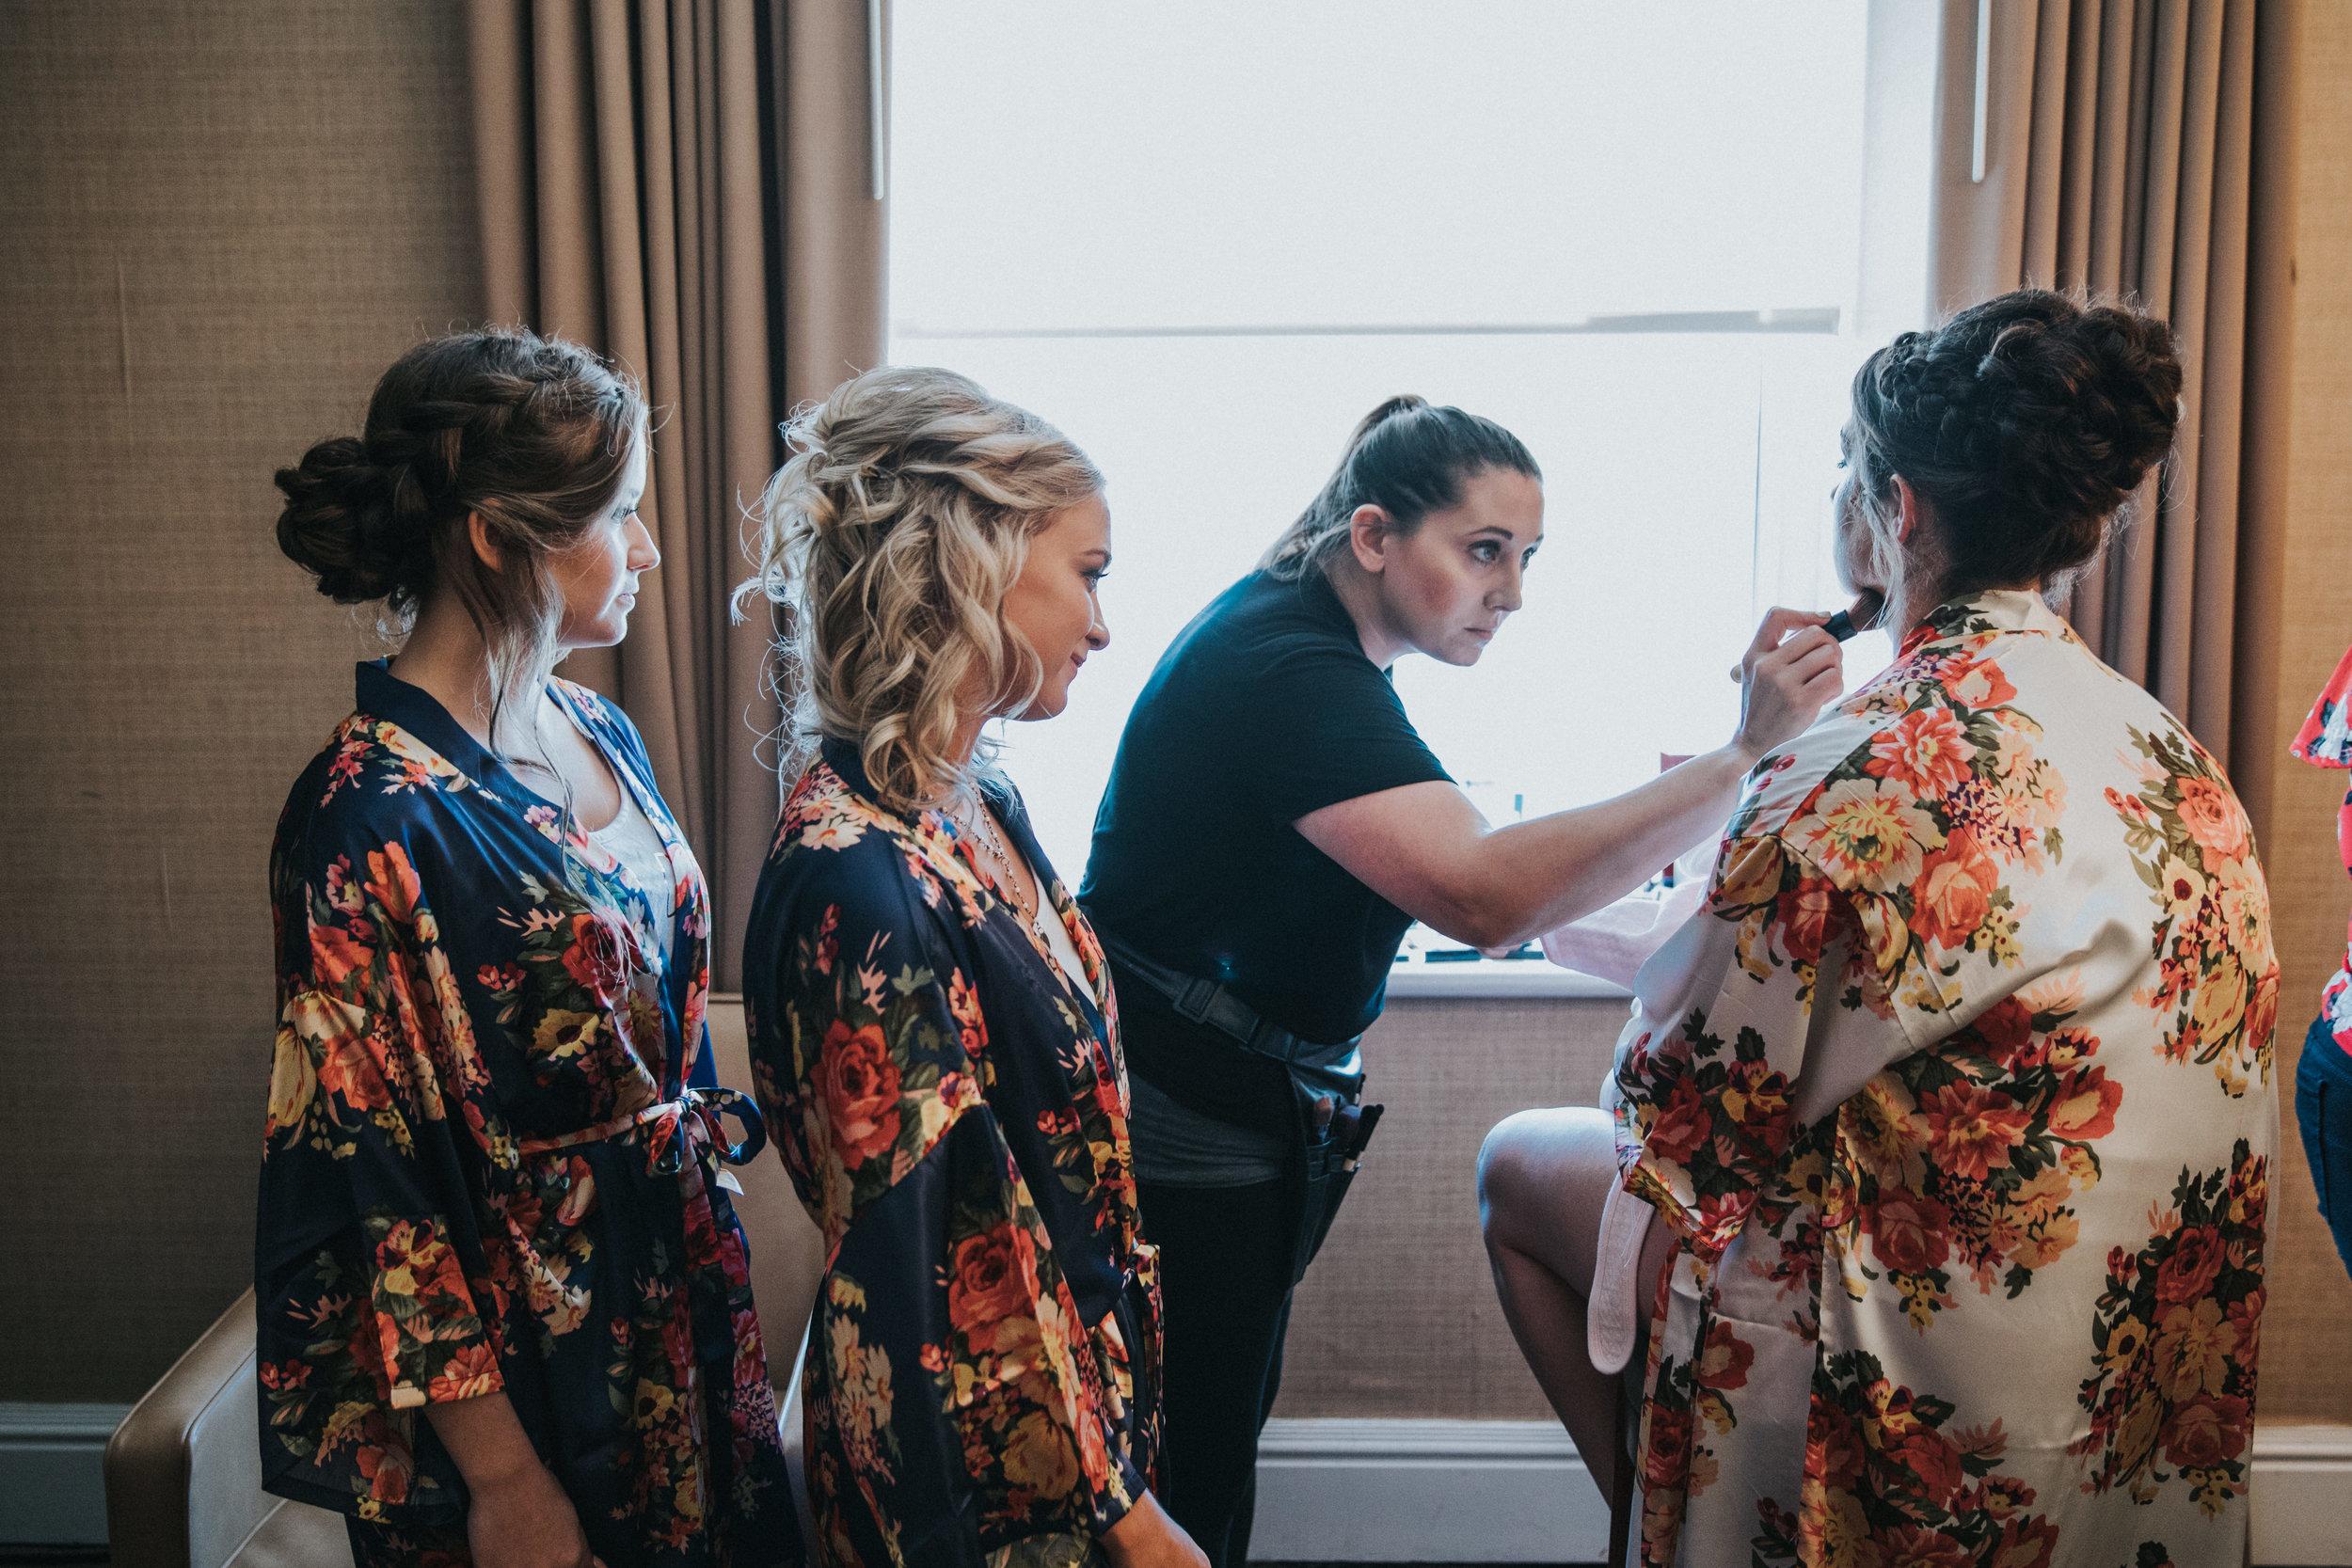 JennaLynnPhotography-NJWeddingPhotographer-Wedding-TheBerkeley-AsburyPark-Allison&Michael-GettingReady-36.jpg